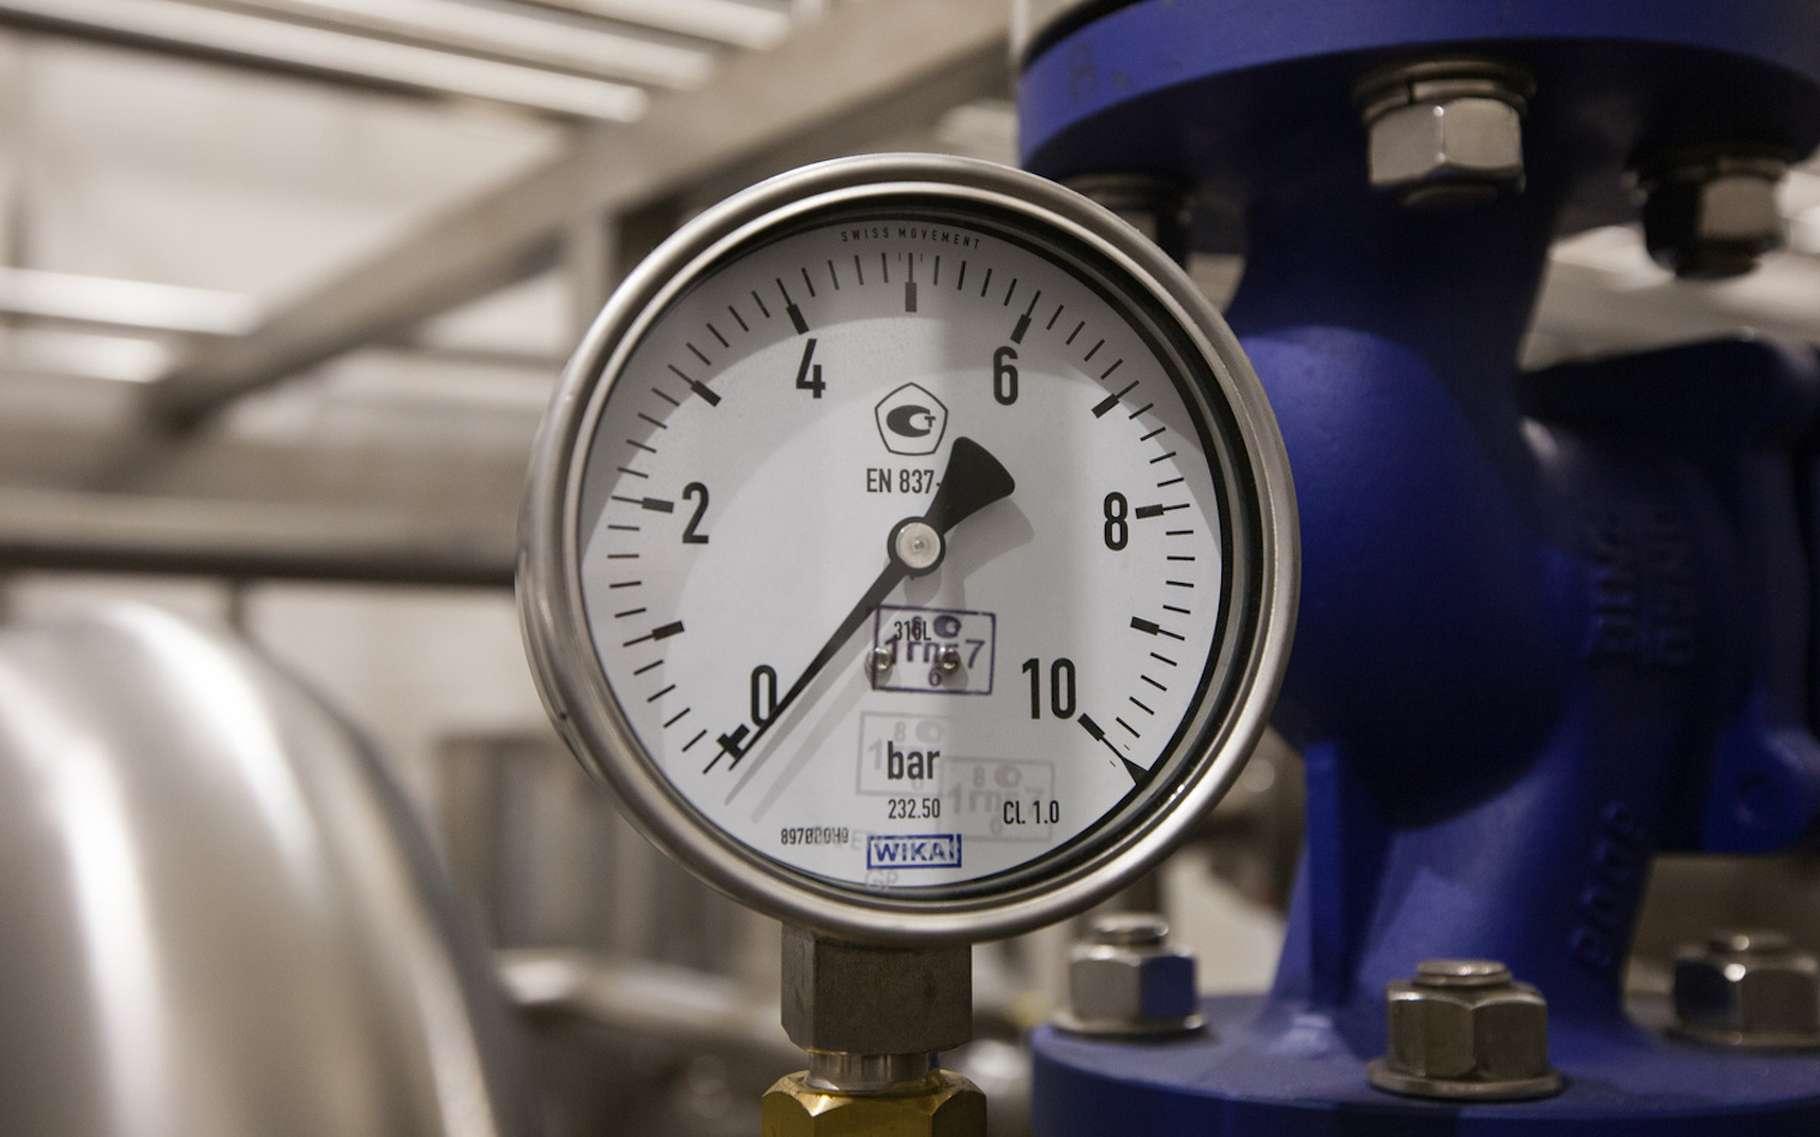 La pression est une grandeur physique mesurée en pascal. © Estrellabuena, Fotolia